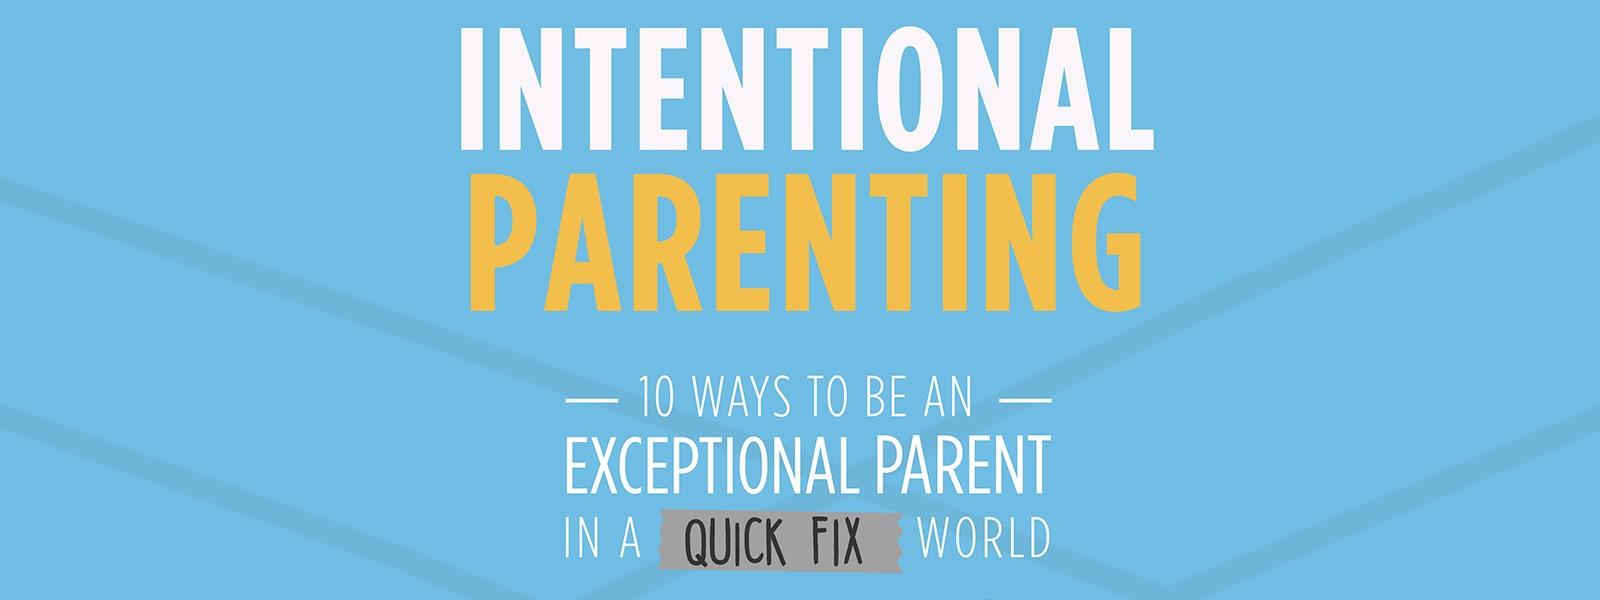 Intentional parenting.jpg